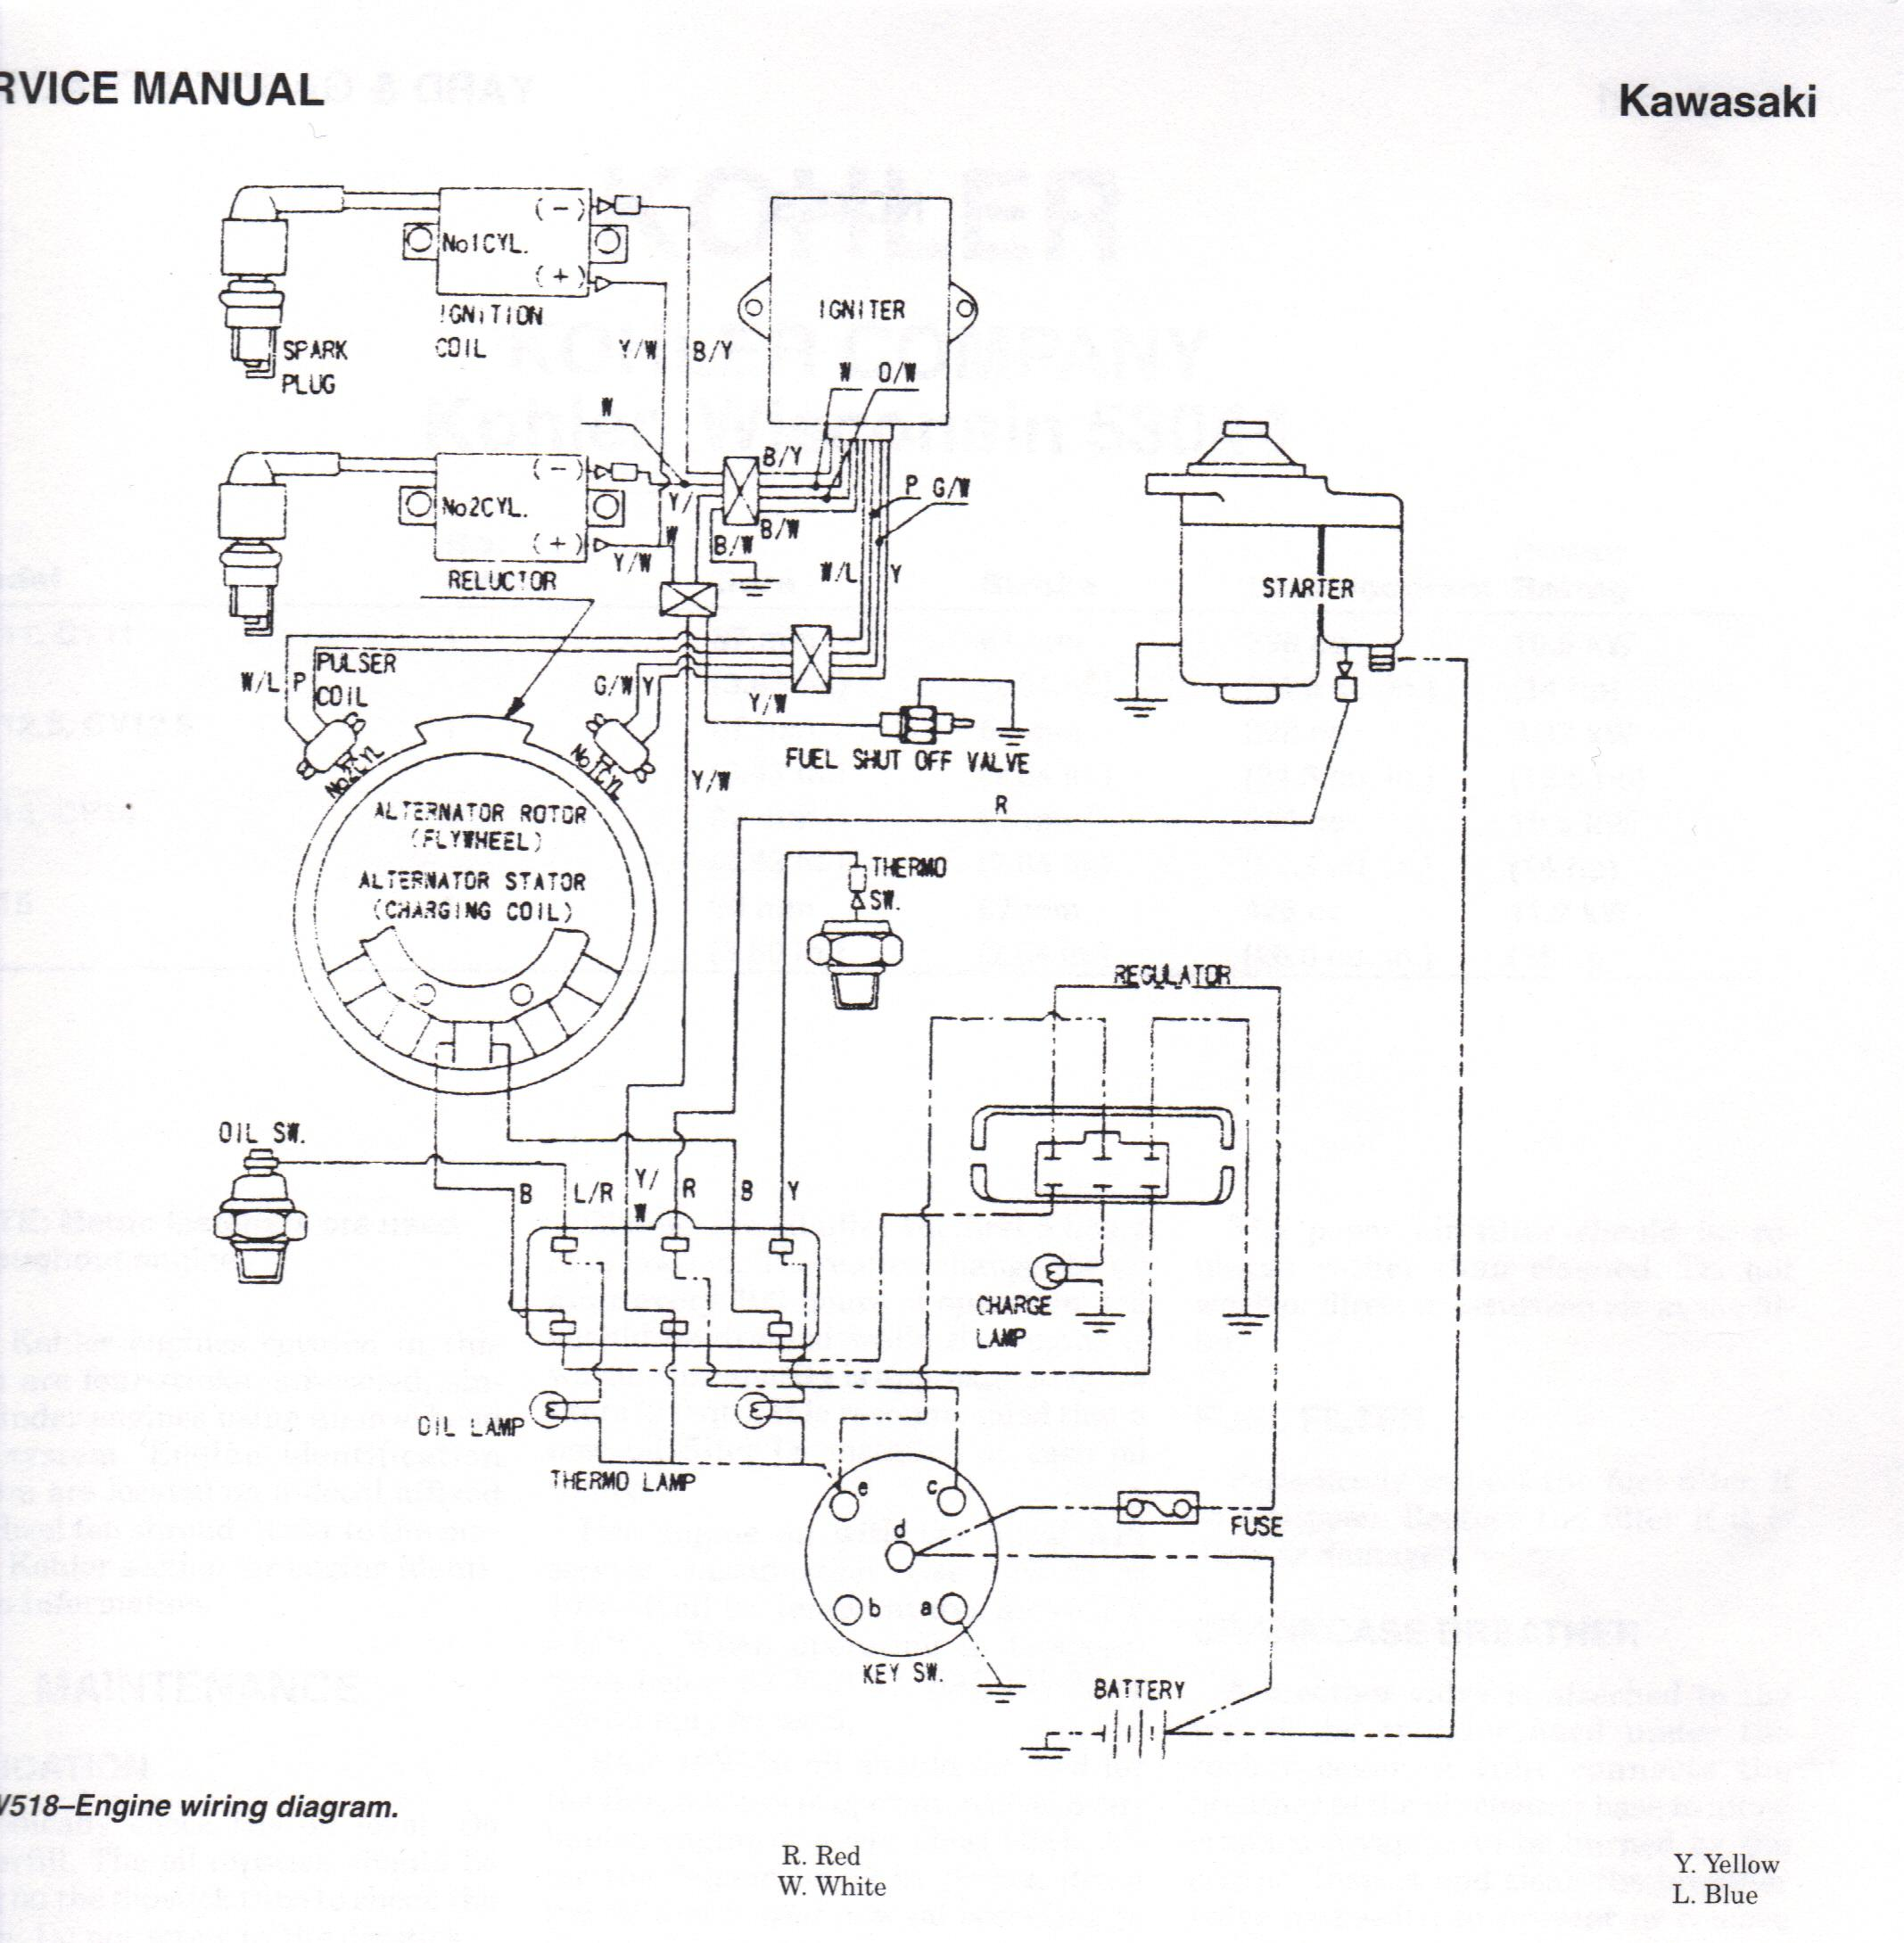 wiring diagram for john deere sabre the wiring diagram john deere wiring diagram nodasystech wiring diagram